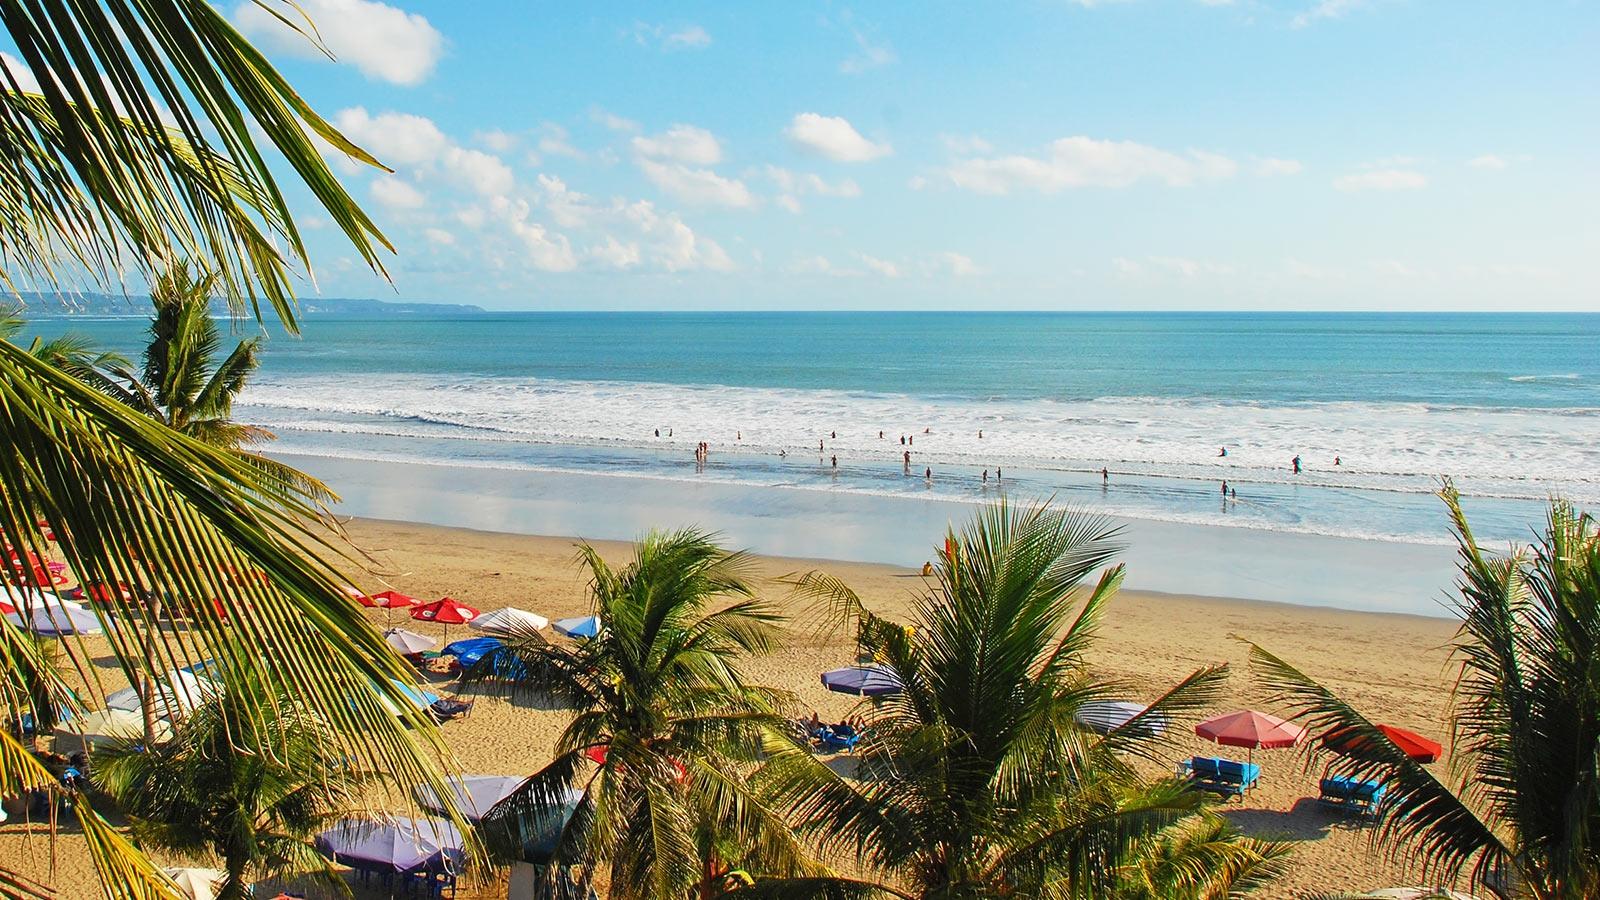 bãi biển Bali 3